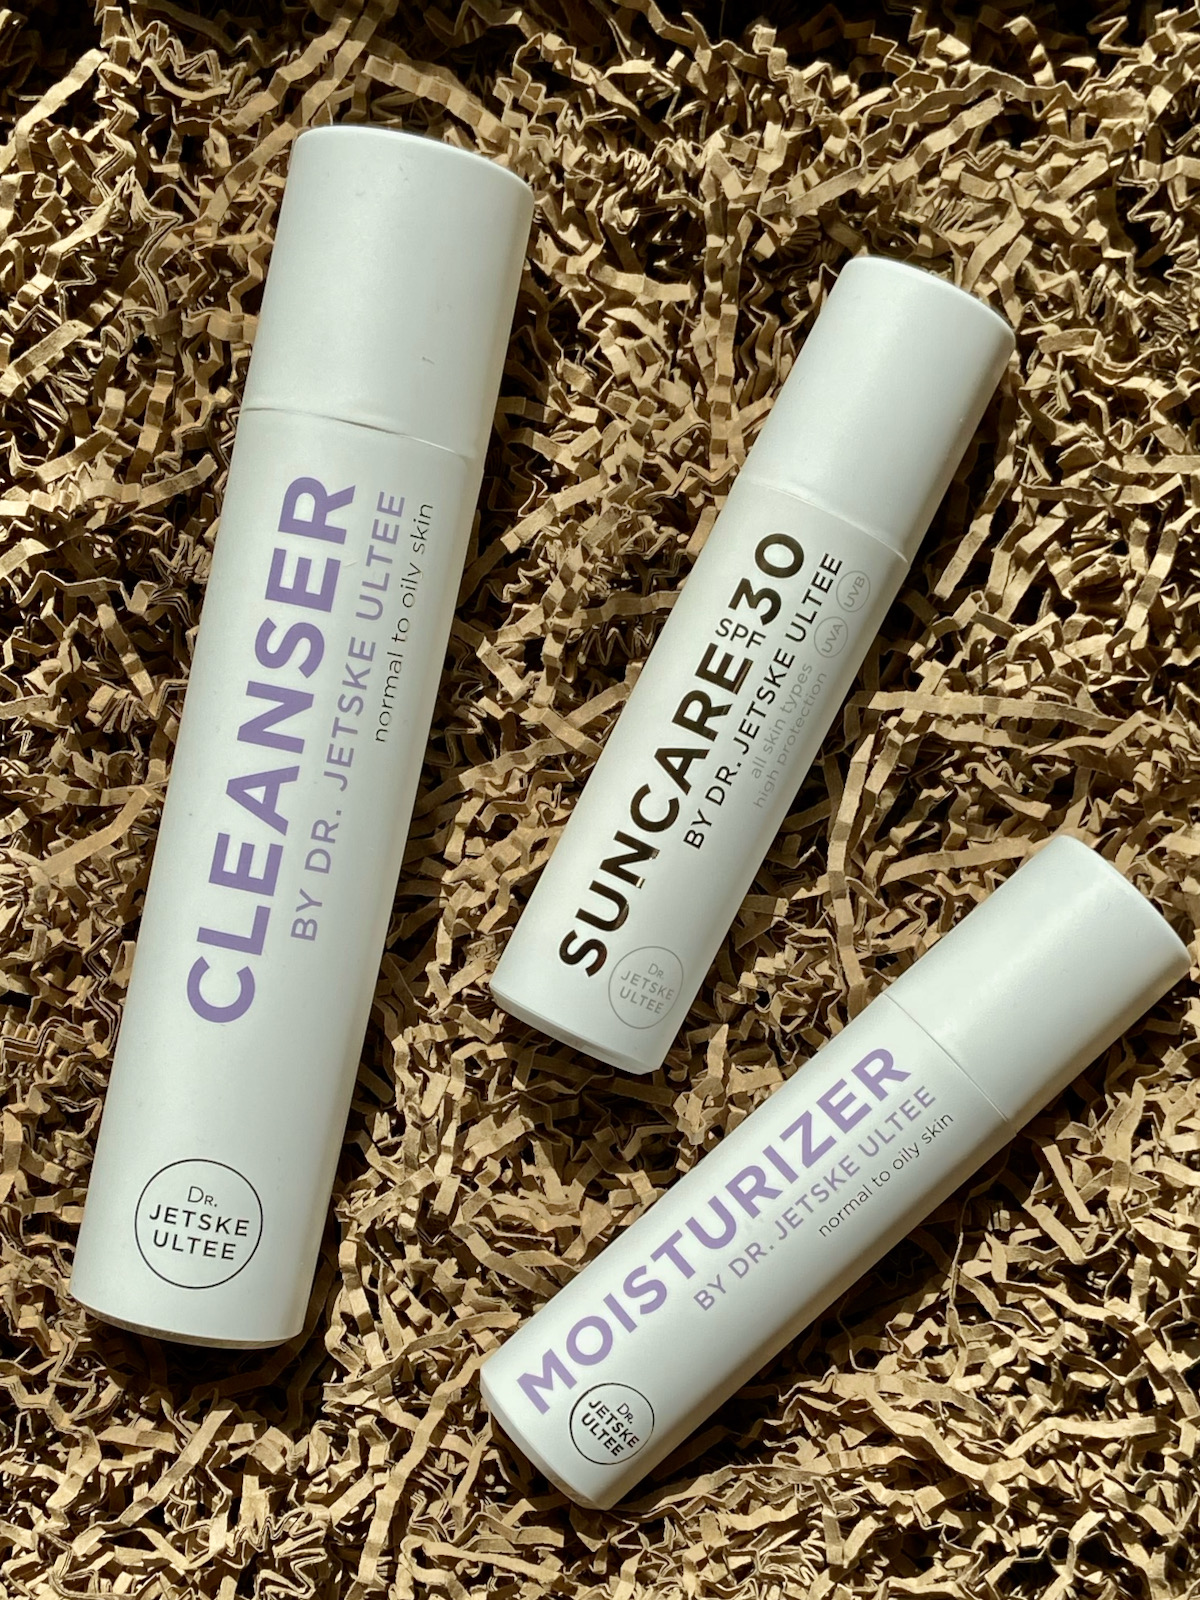 Uncover Skincare Cleanser Suncare SPF30 Moisturizer